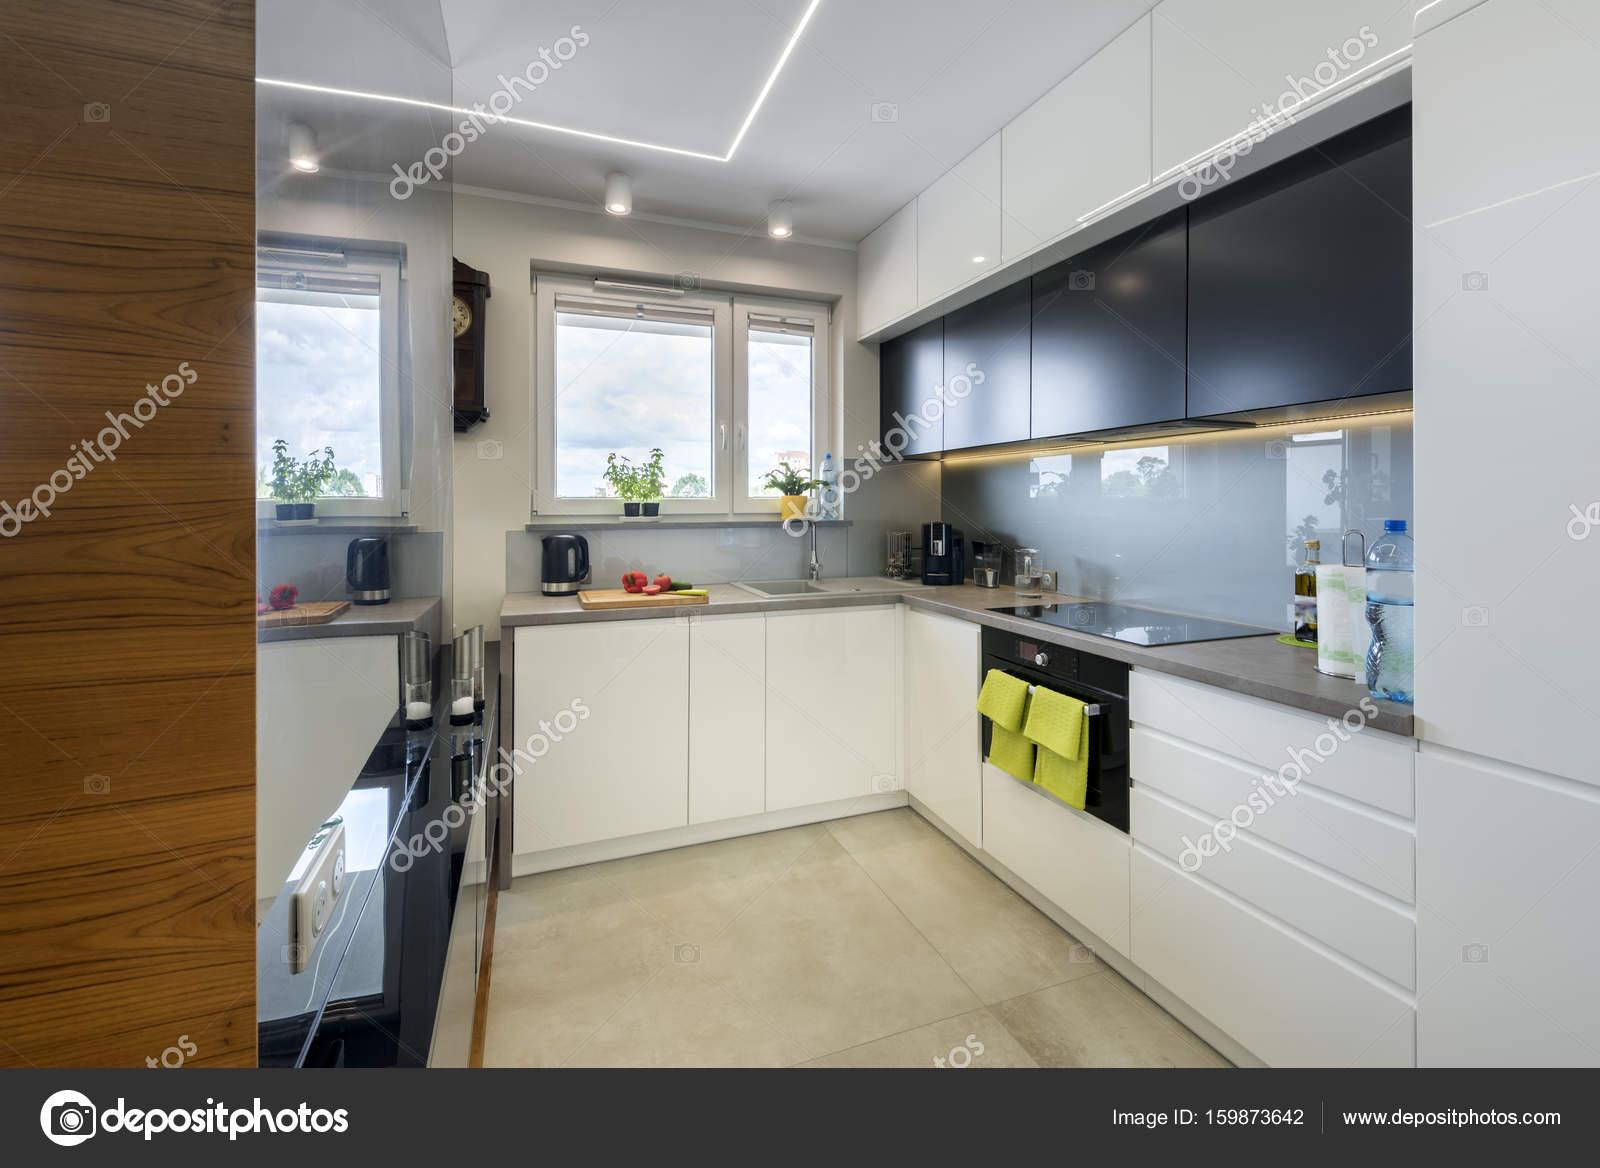 Arredamento cucina moderna — Foto Stock © jacek_kadaj #159873642